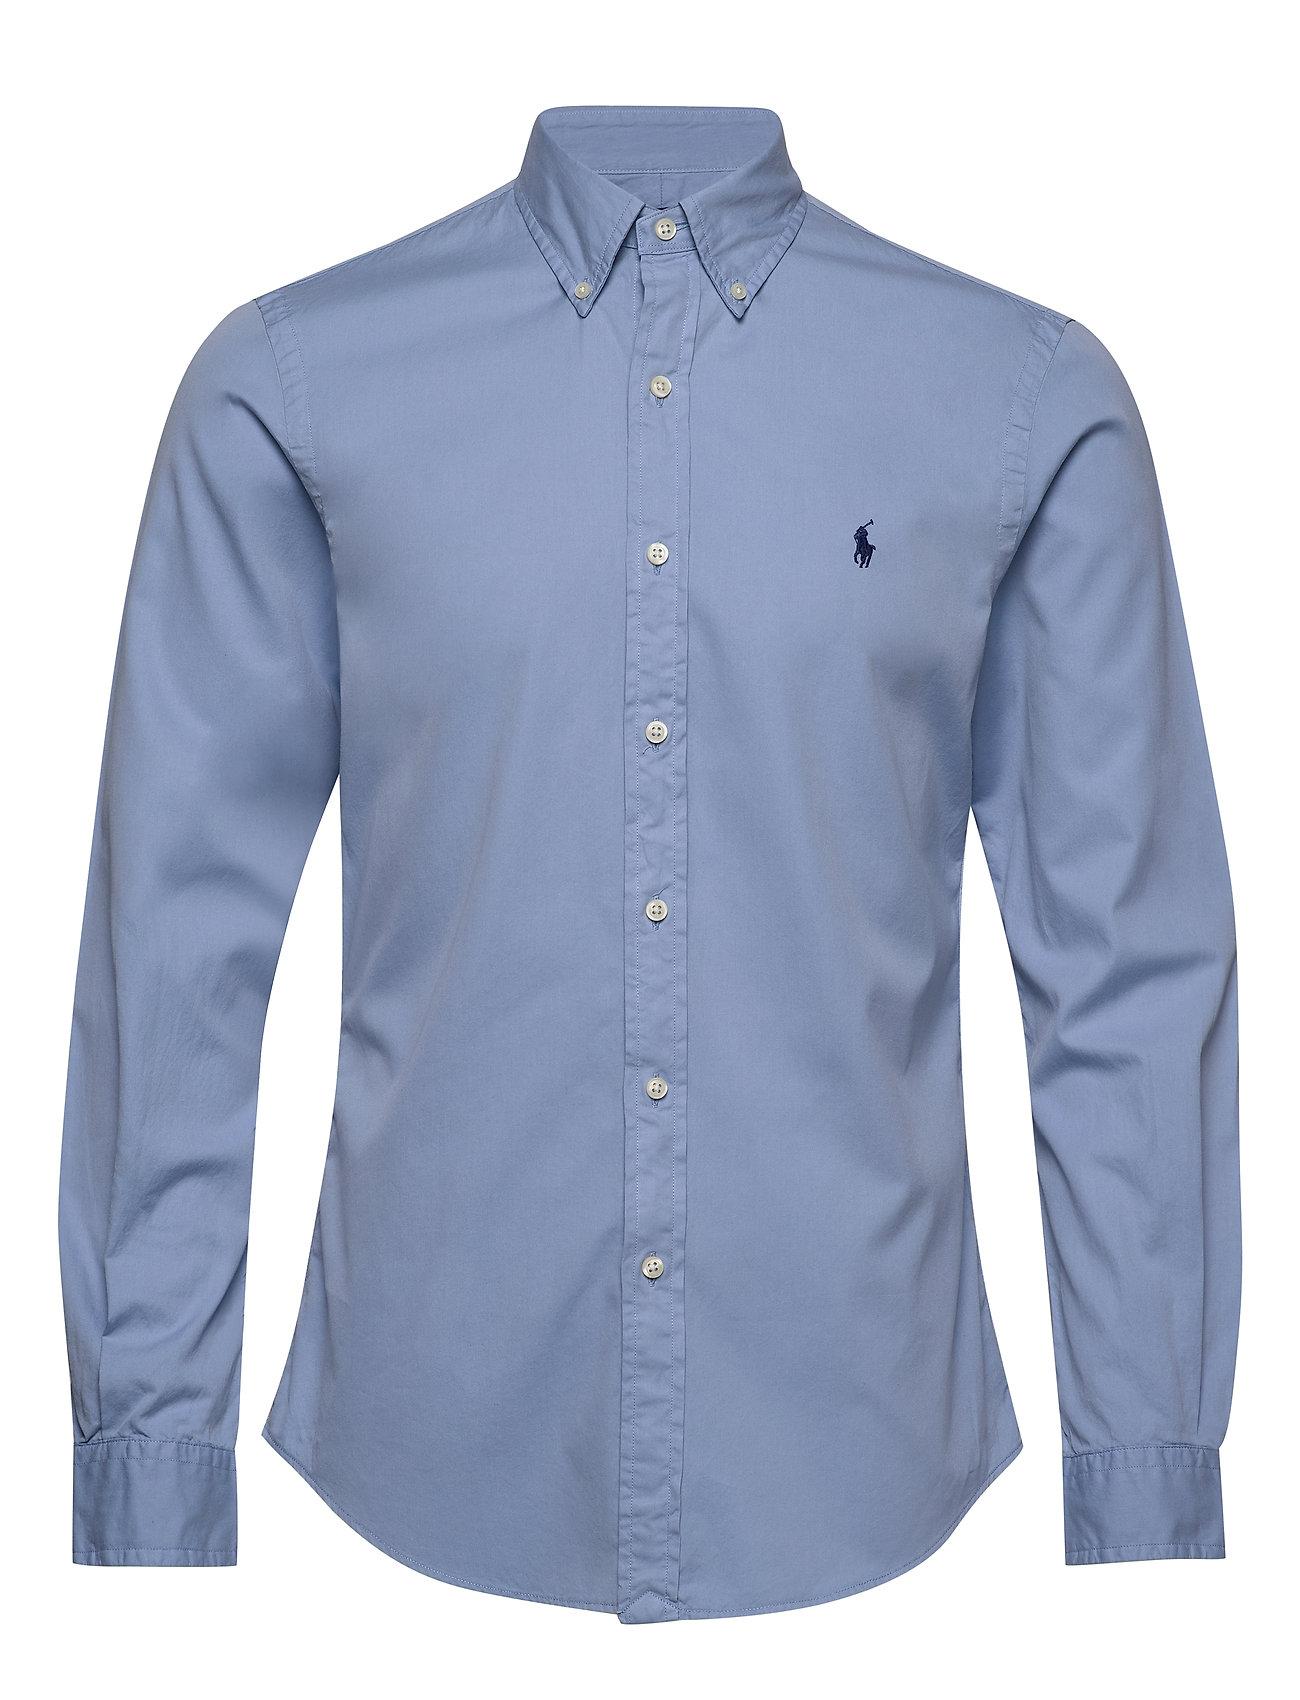 Polo Ralph Lauren GD CHINO-SLBDPPCSPT - DRESS SHIRT BLUE